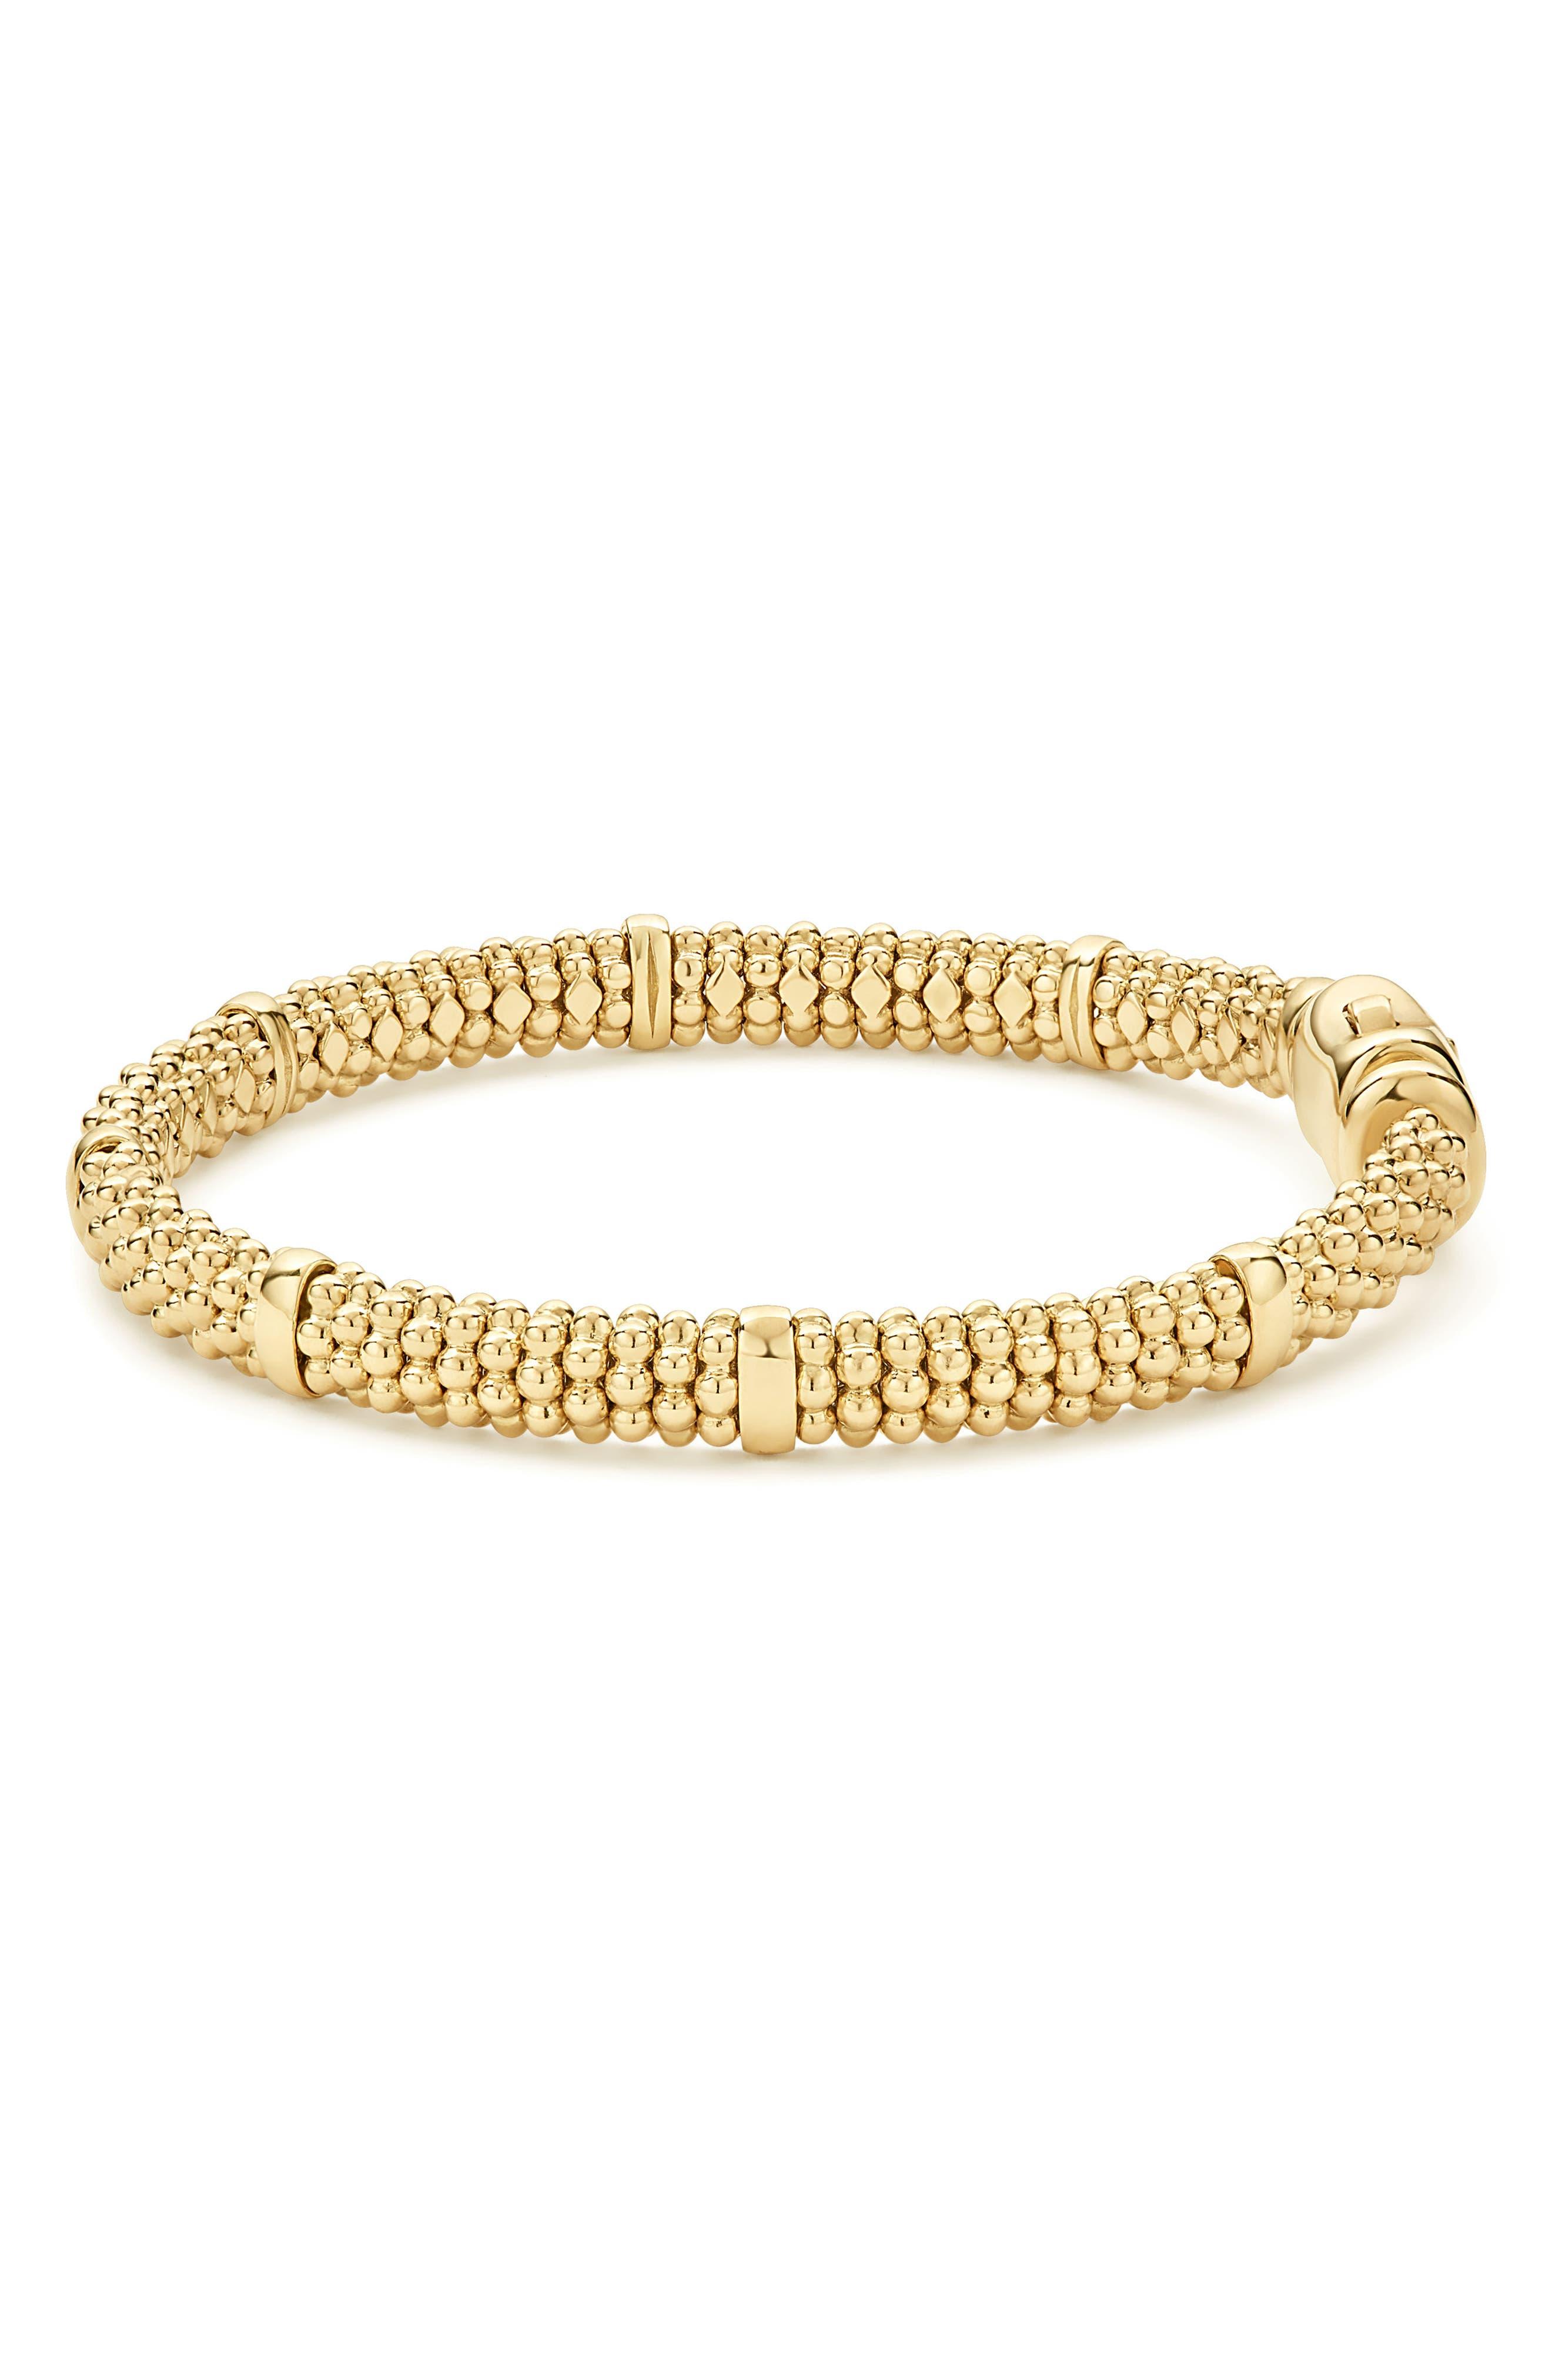 Caviar Rope Bracelet,                             Alternate thumbnail 7, color,                             GOLD